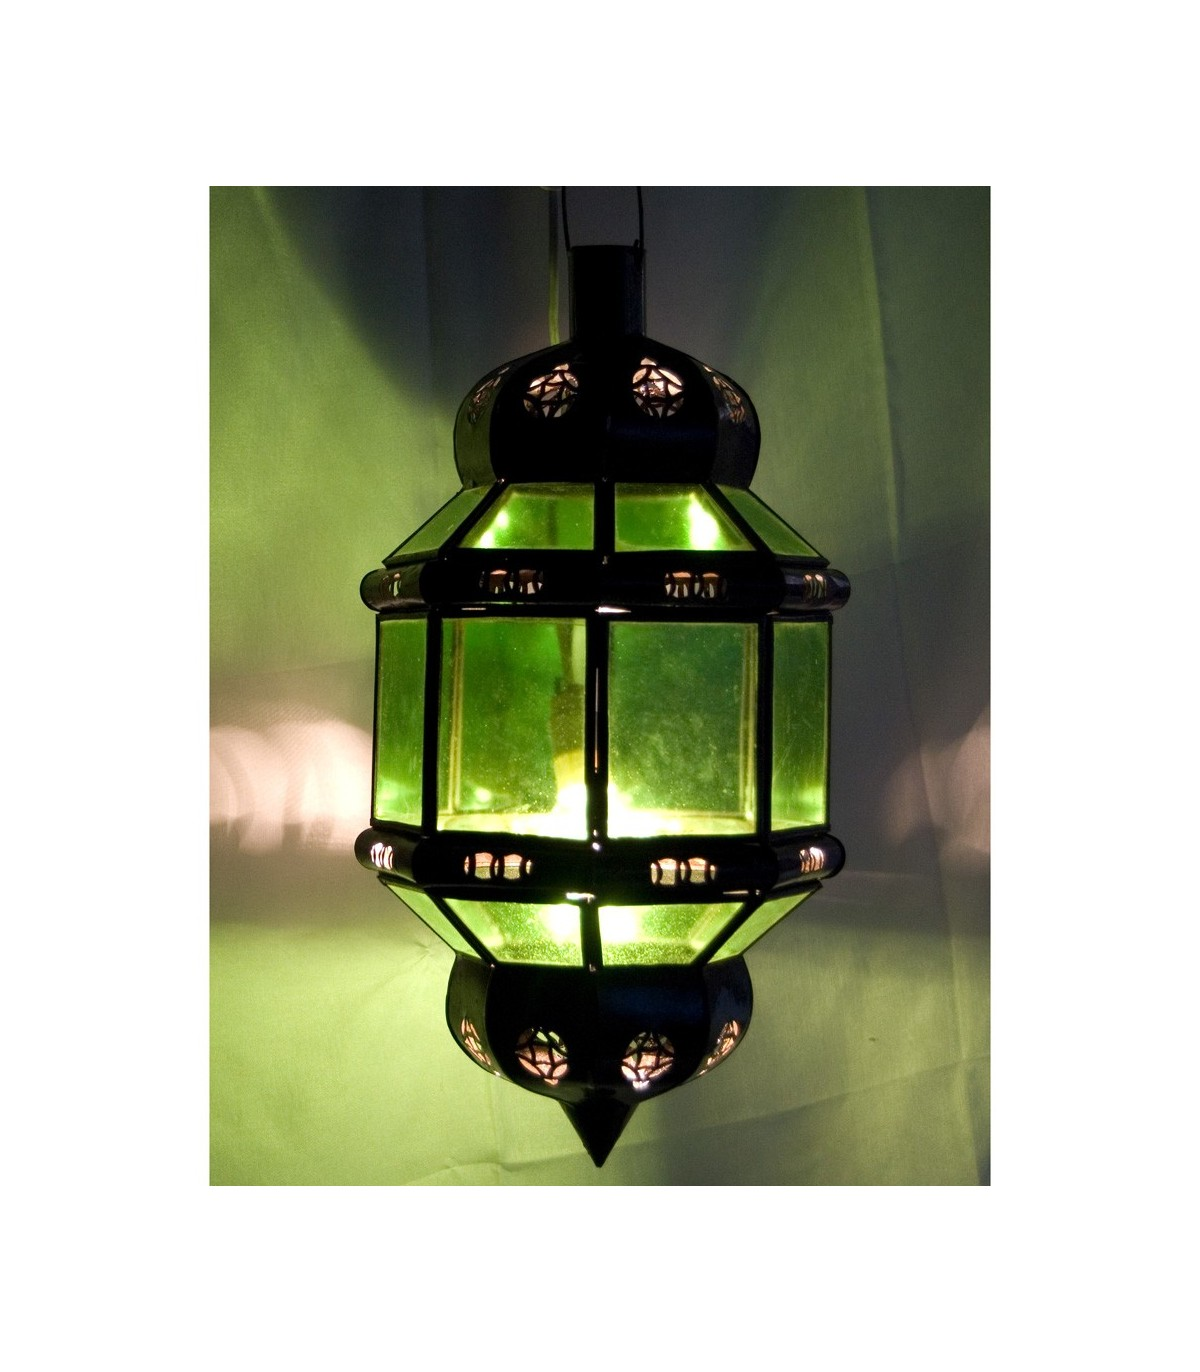 Varios Octogonal Colores Lámpara Andalusí Transparente mvNn0w8